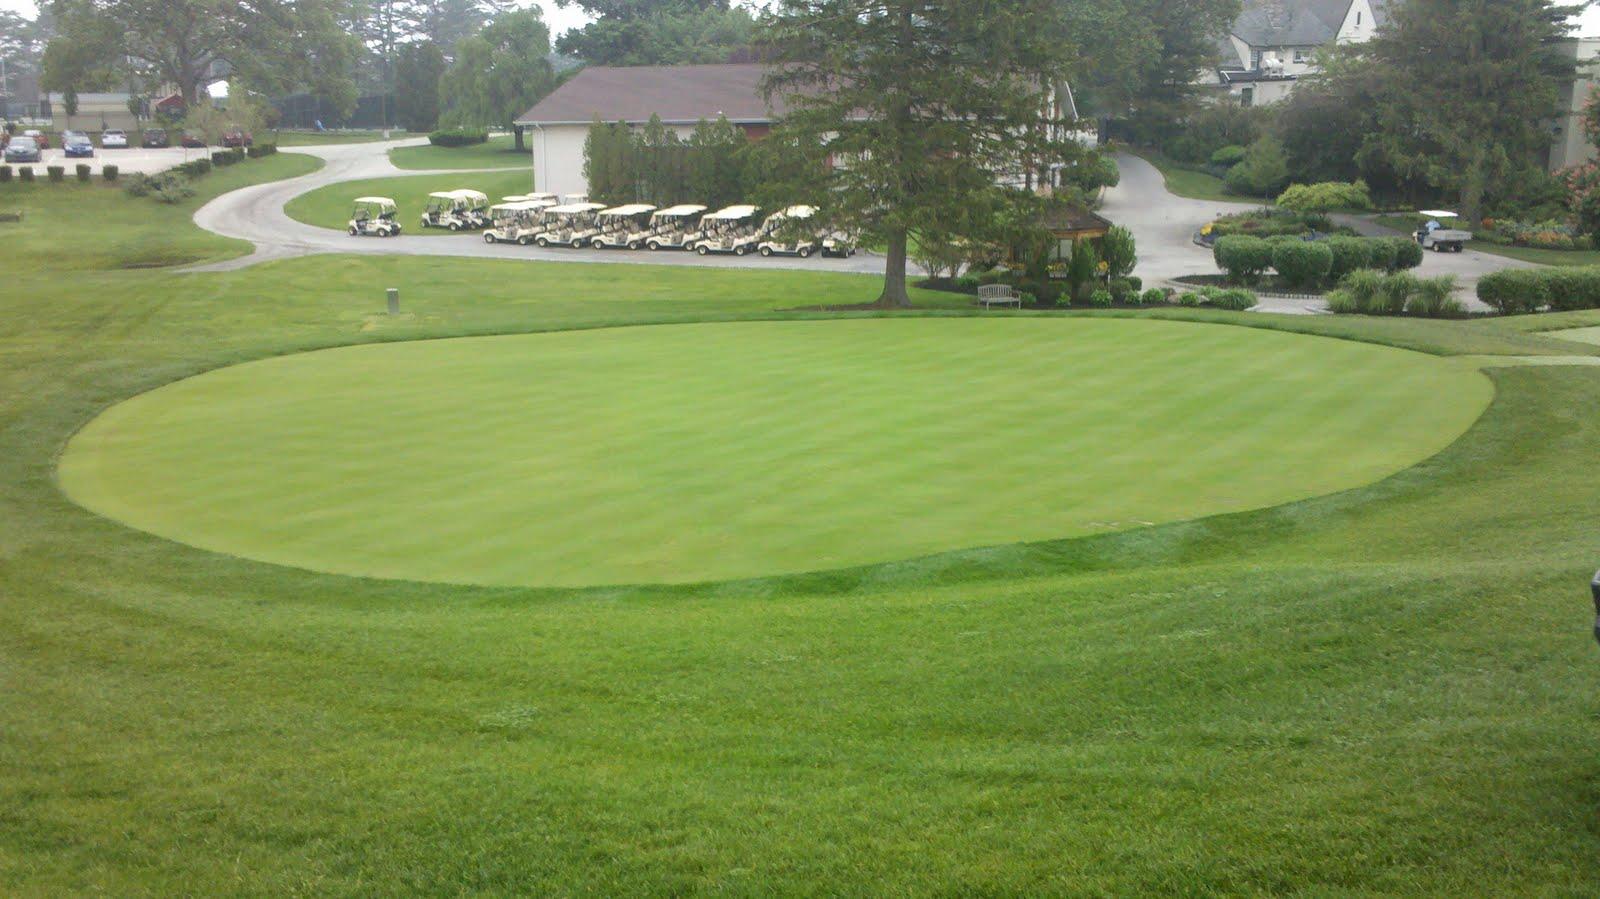 Llanerch Golf Course and External Activities: New Putting ...